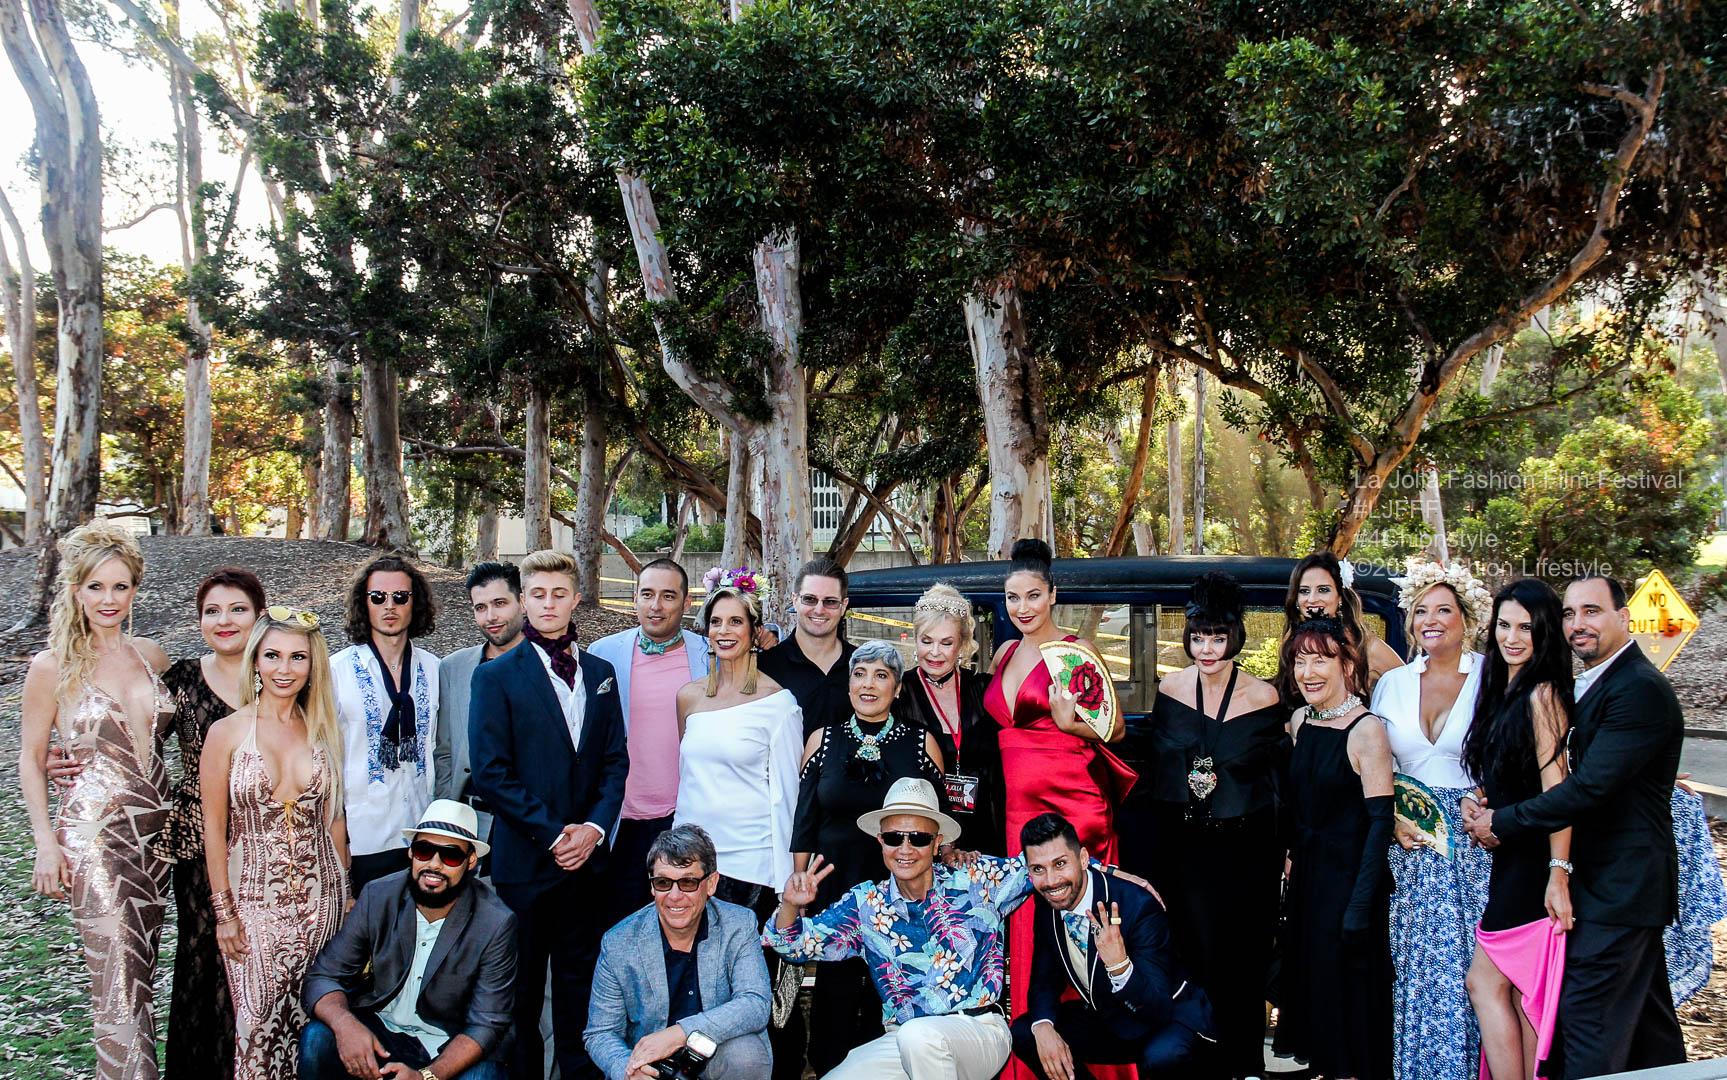 La Jolla Fashion Film Festival Red Carpet LJFFF 4Chion Lifestyle